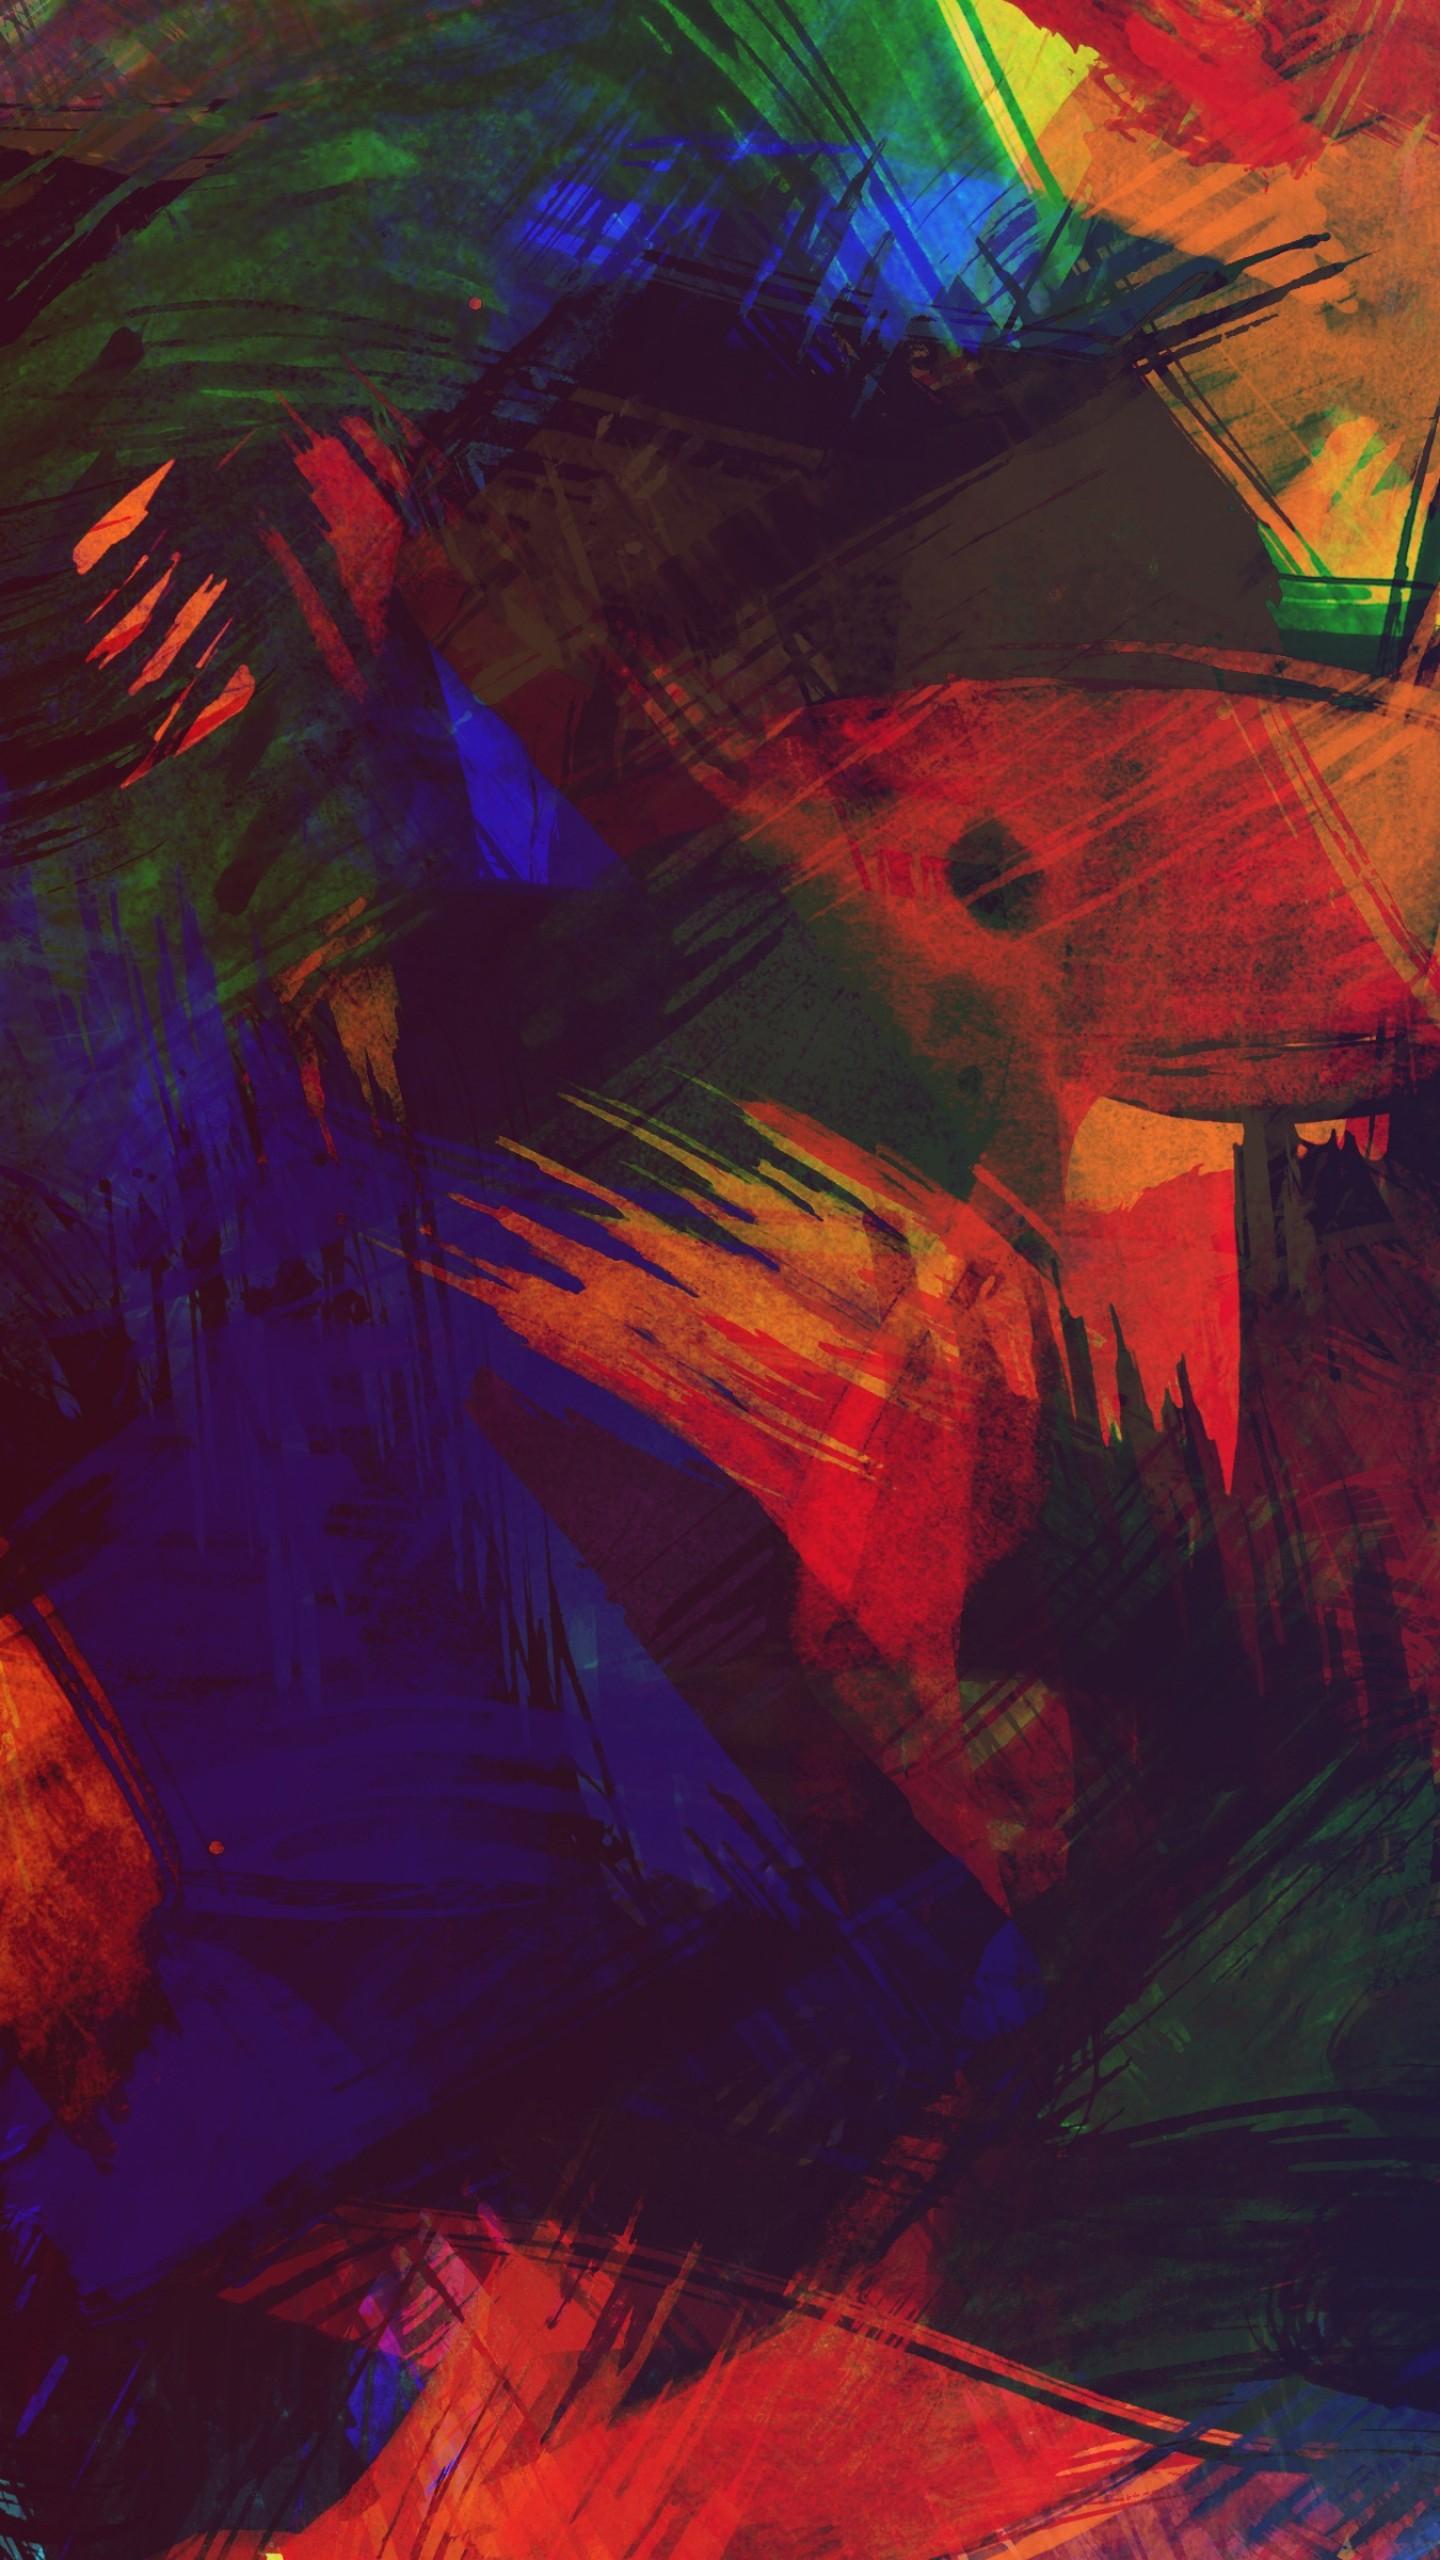 عکس زمینه بافت رنگارنگ نقاشی مدرن پس زمینه